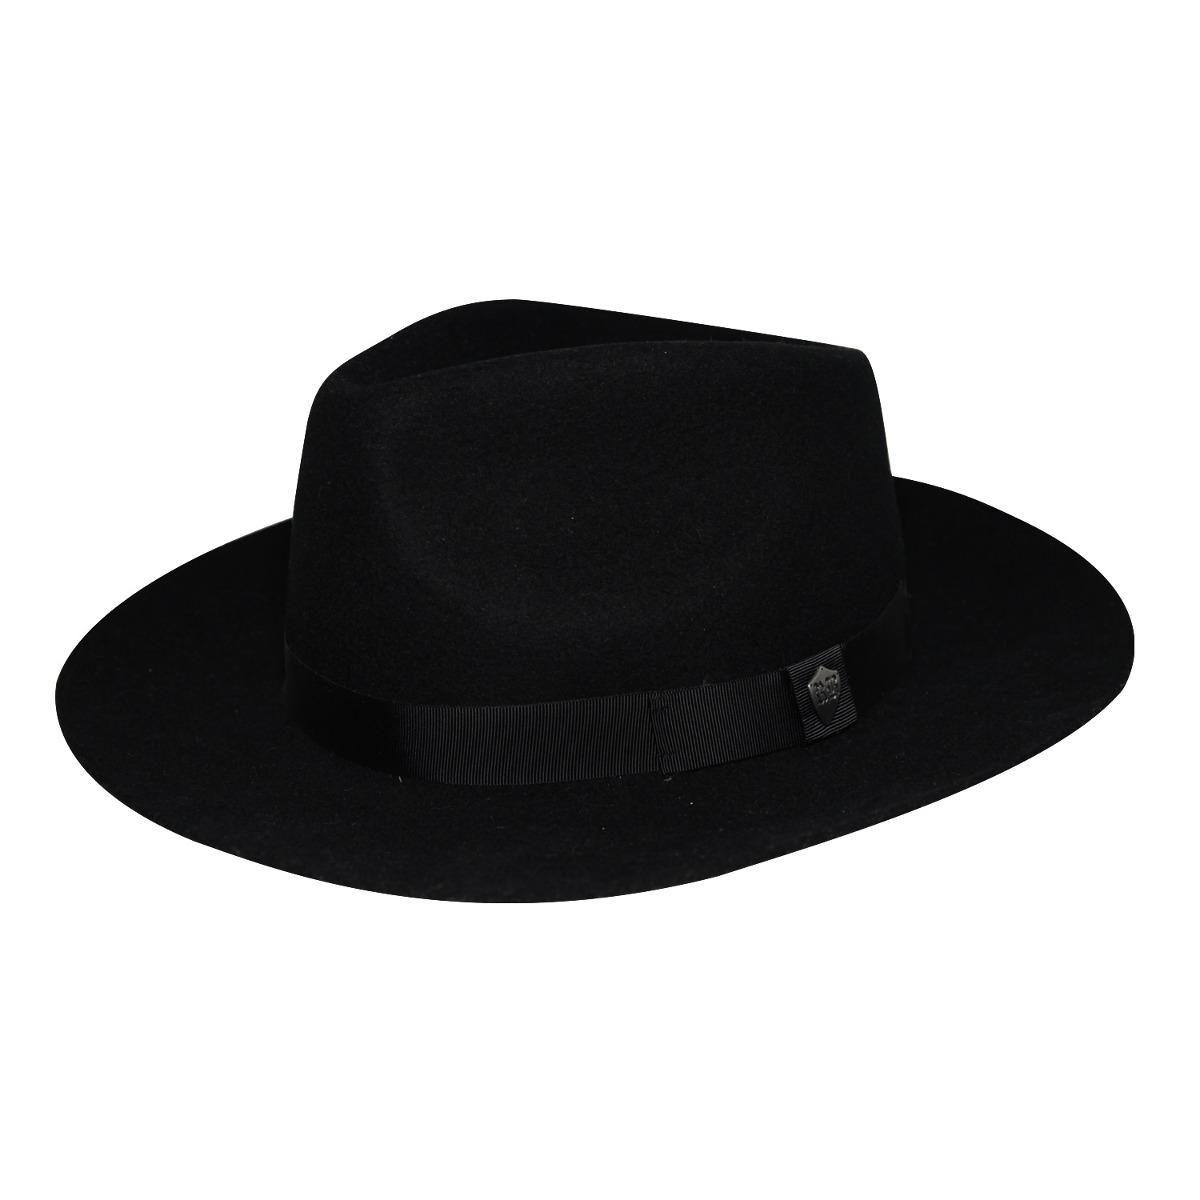 40b8356cd6b8a chapéu fedora feltro preto aba grande faixa lisa top-tam 59. Carregando zoom .